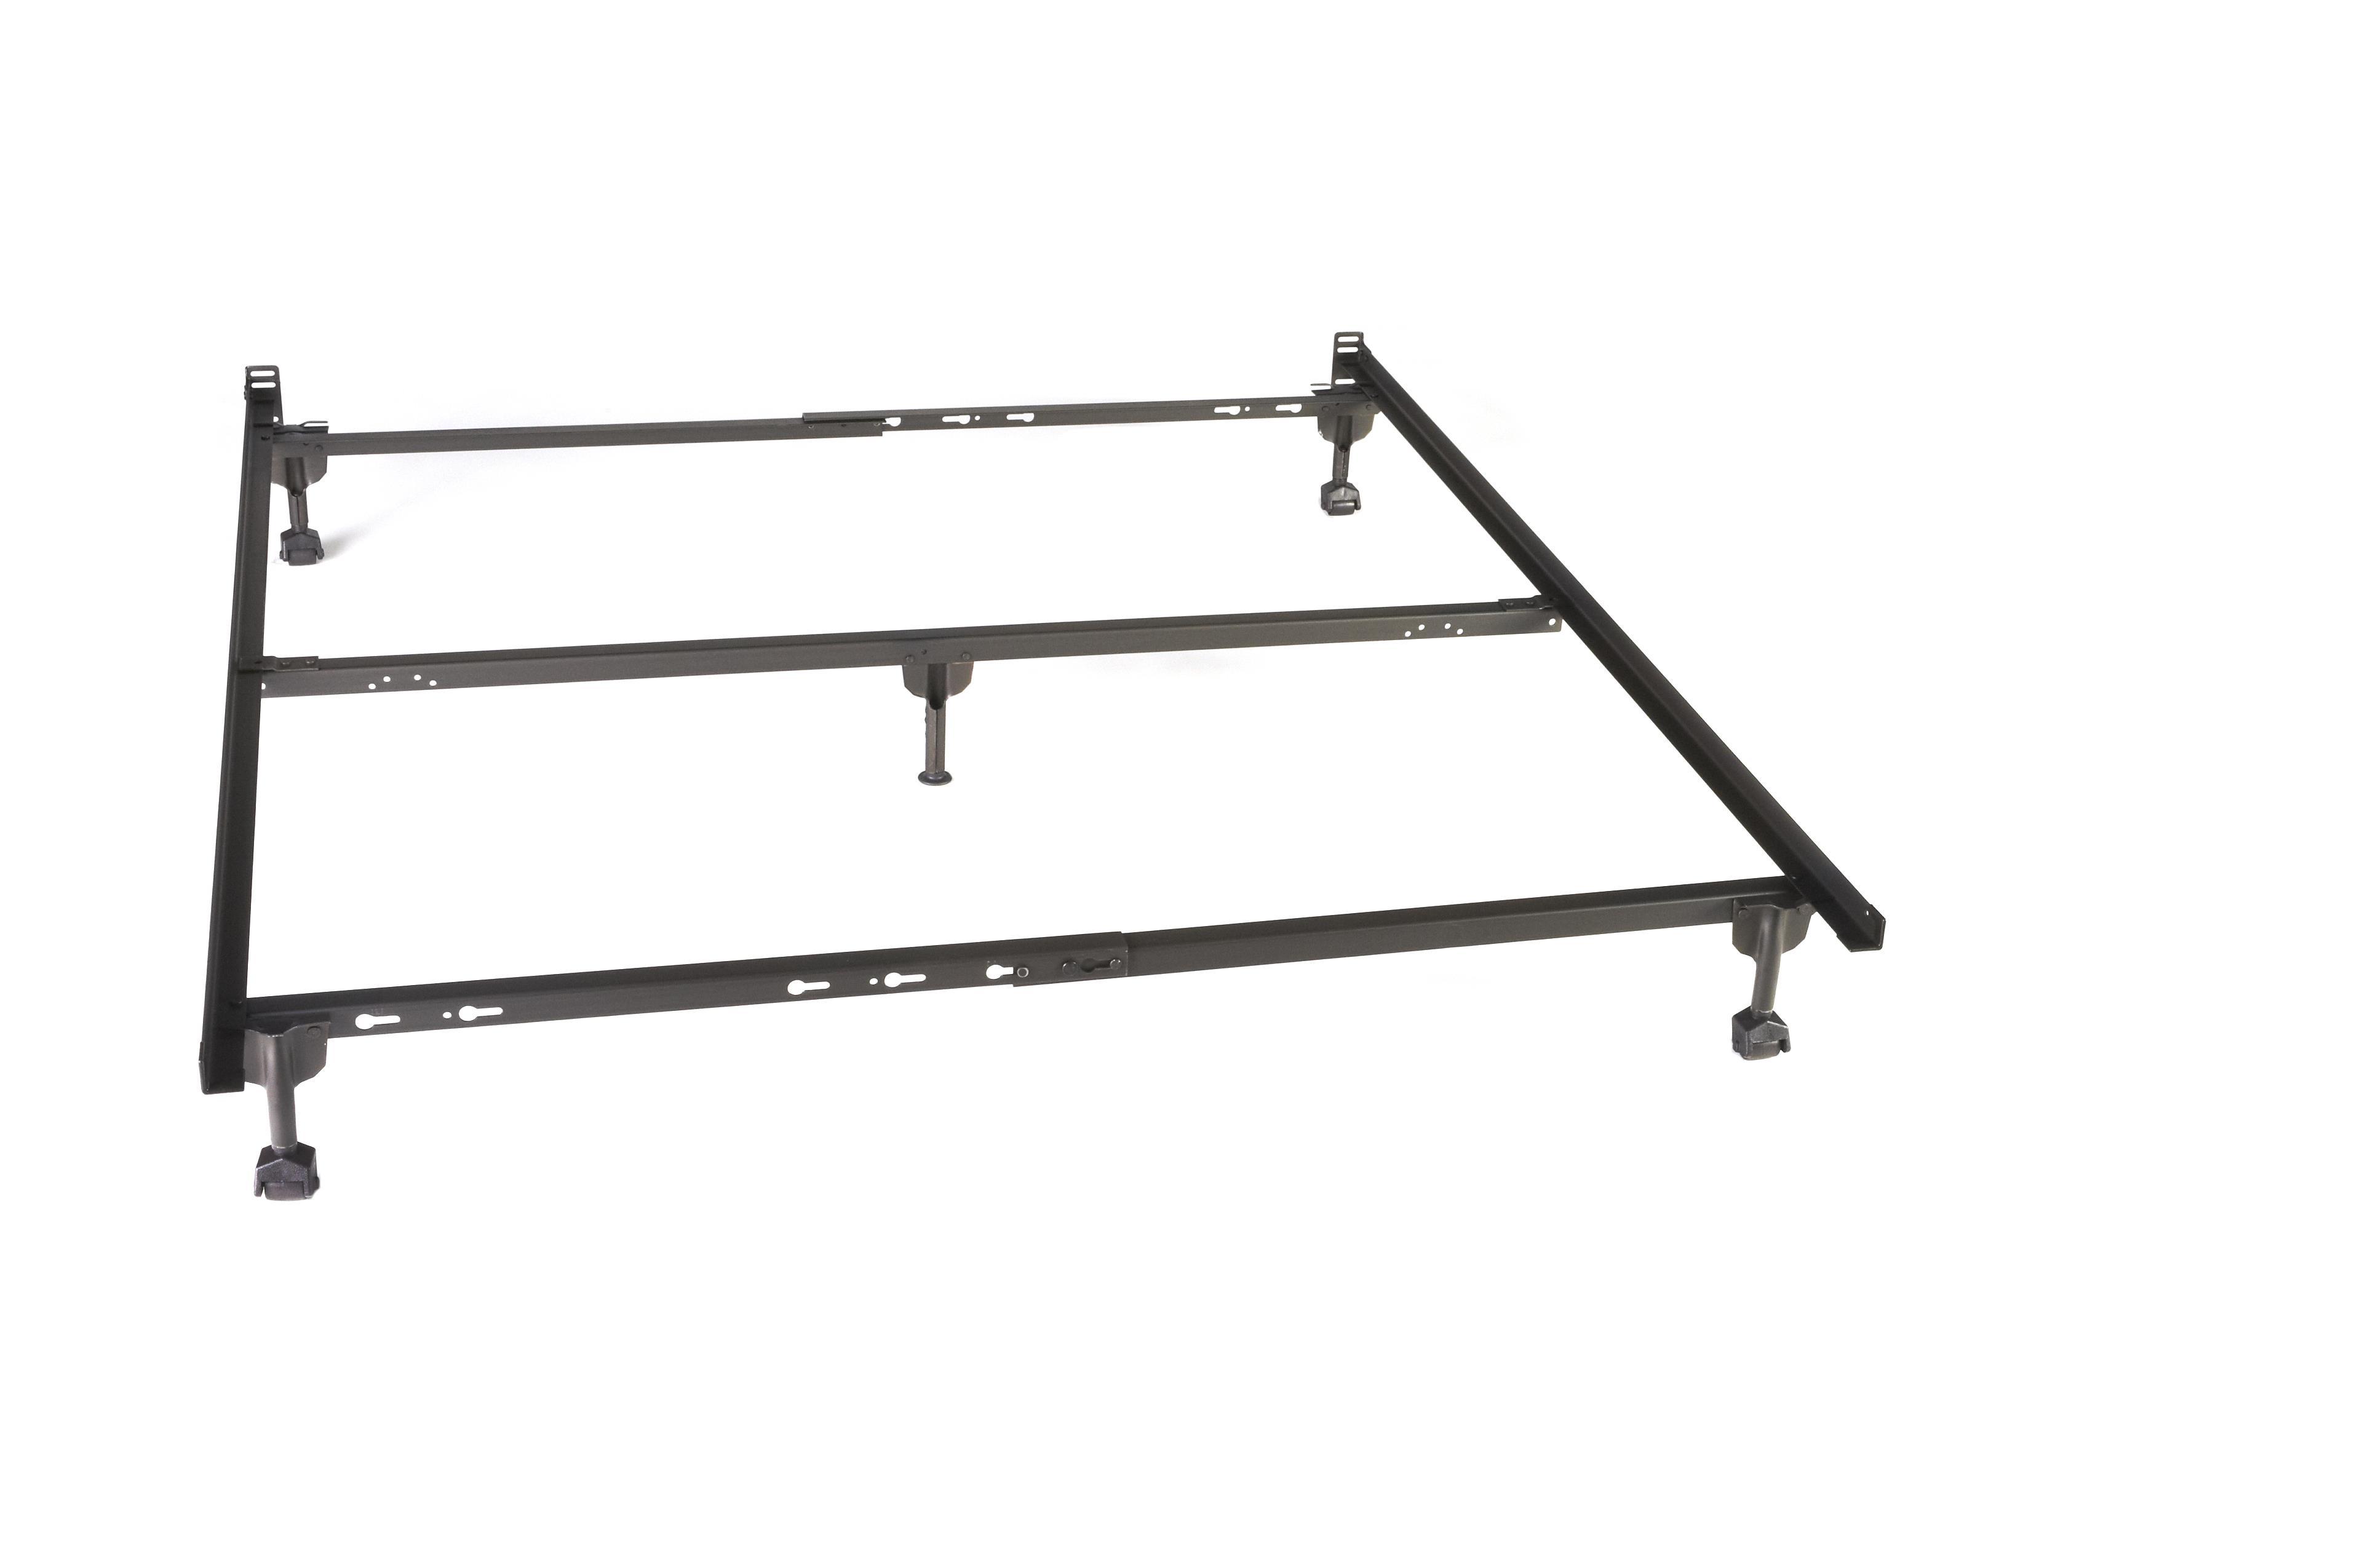 Glideaway Classic Rug Roller 5 Leg Queen Rug Roller Bed Frame - Item Number: 35R